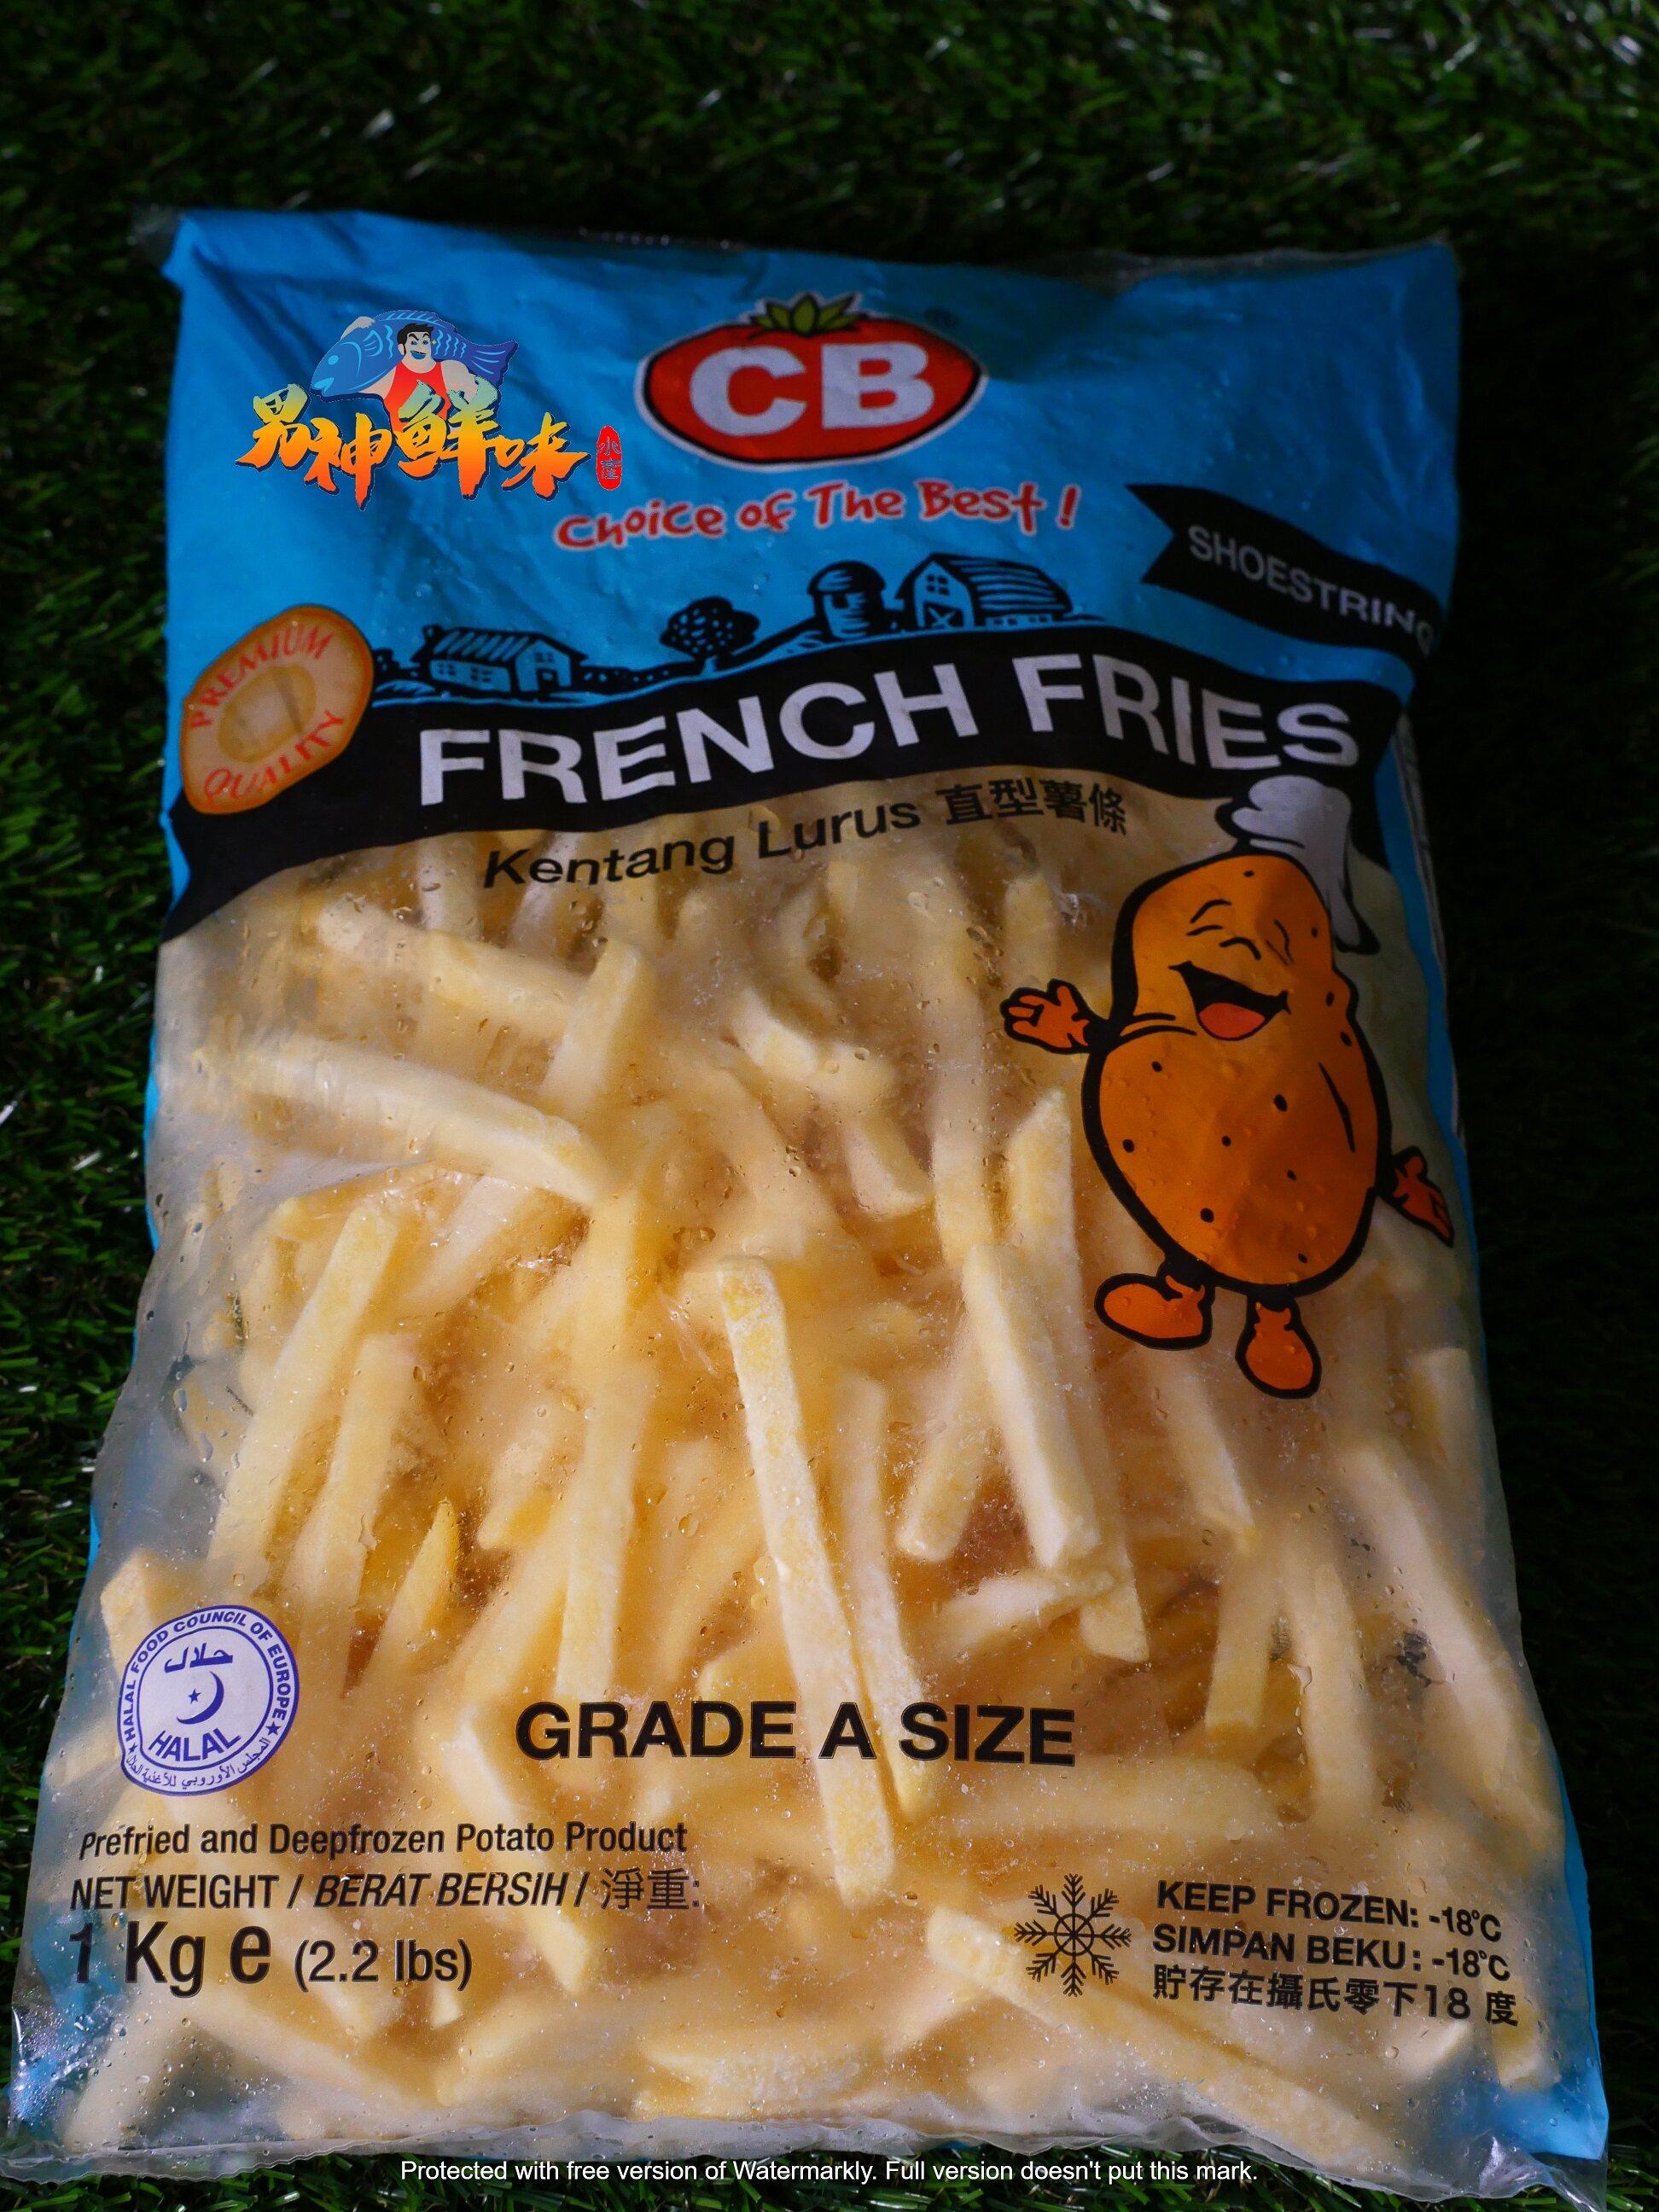 CB FRENCH FRIES SHOESTRING 1KG 直条型薯条